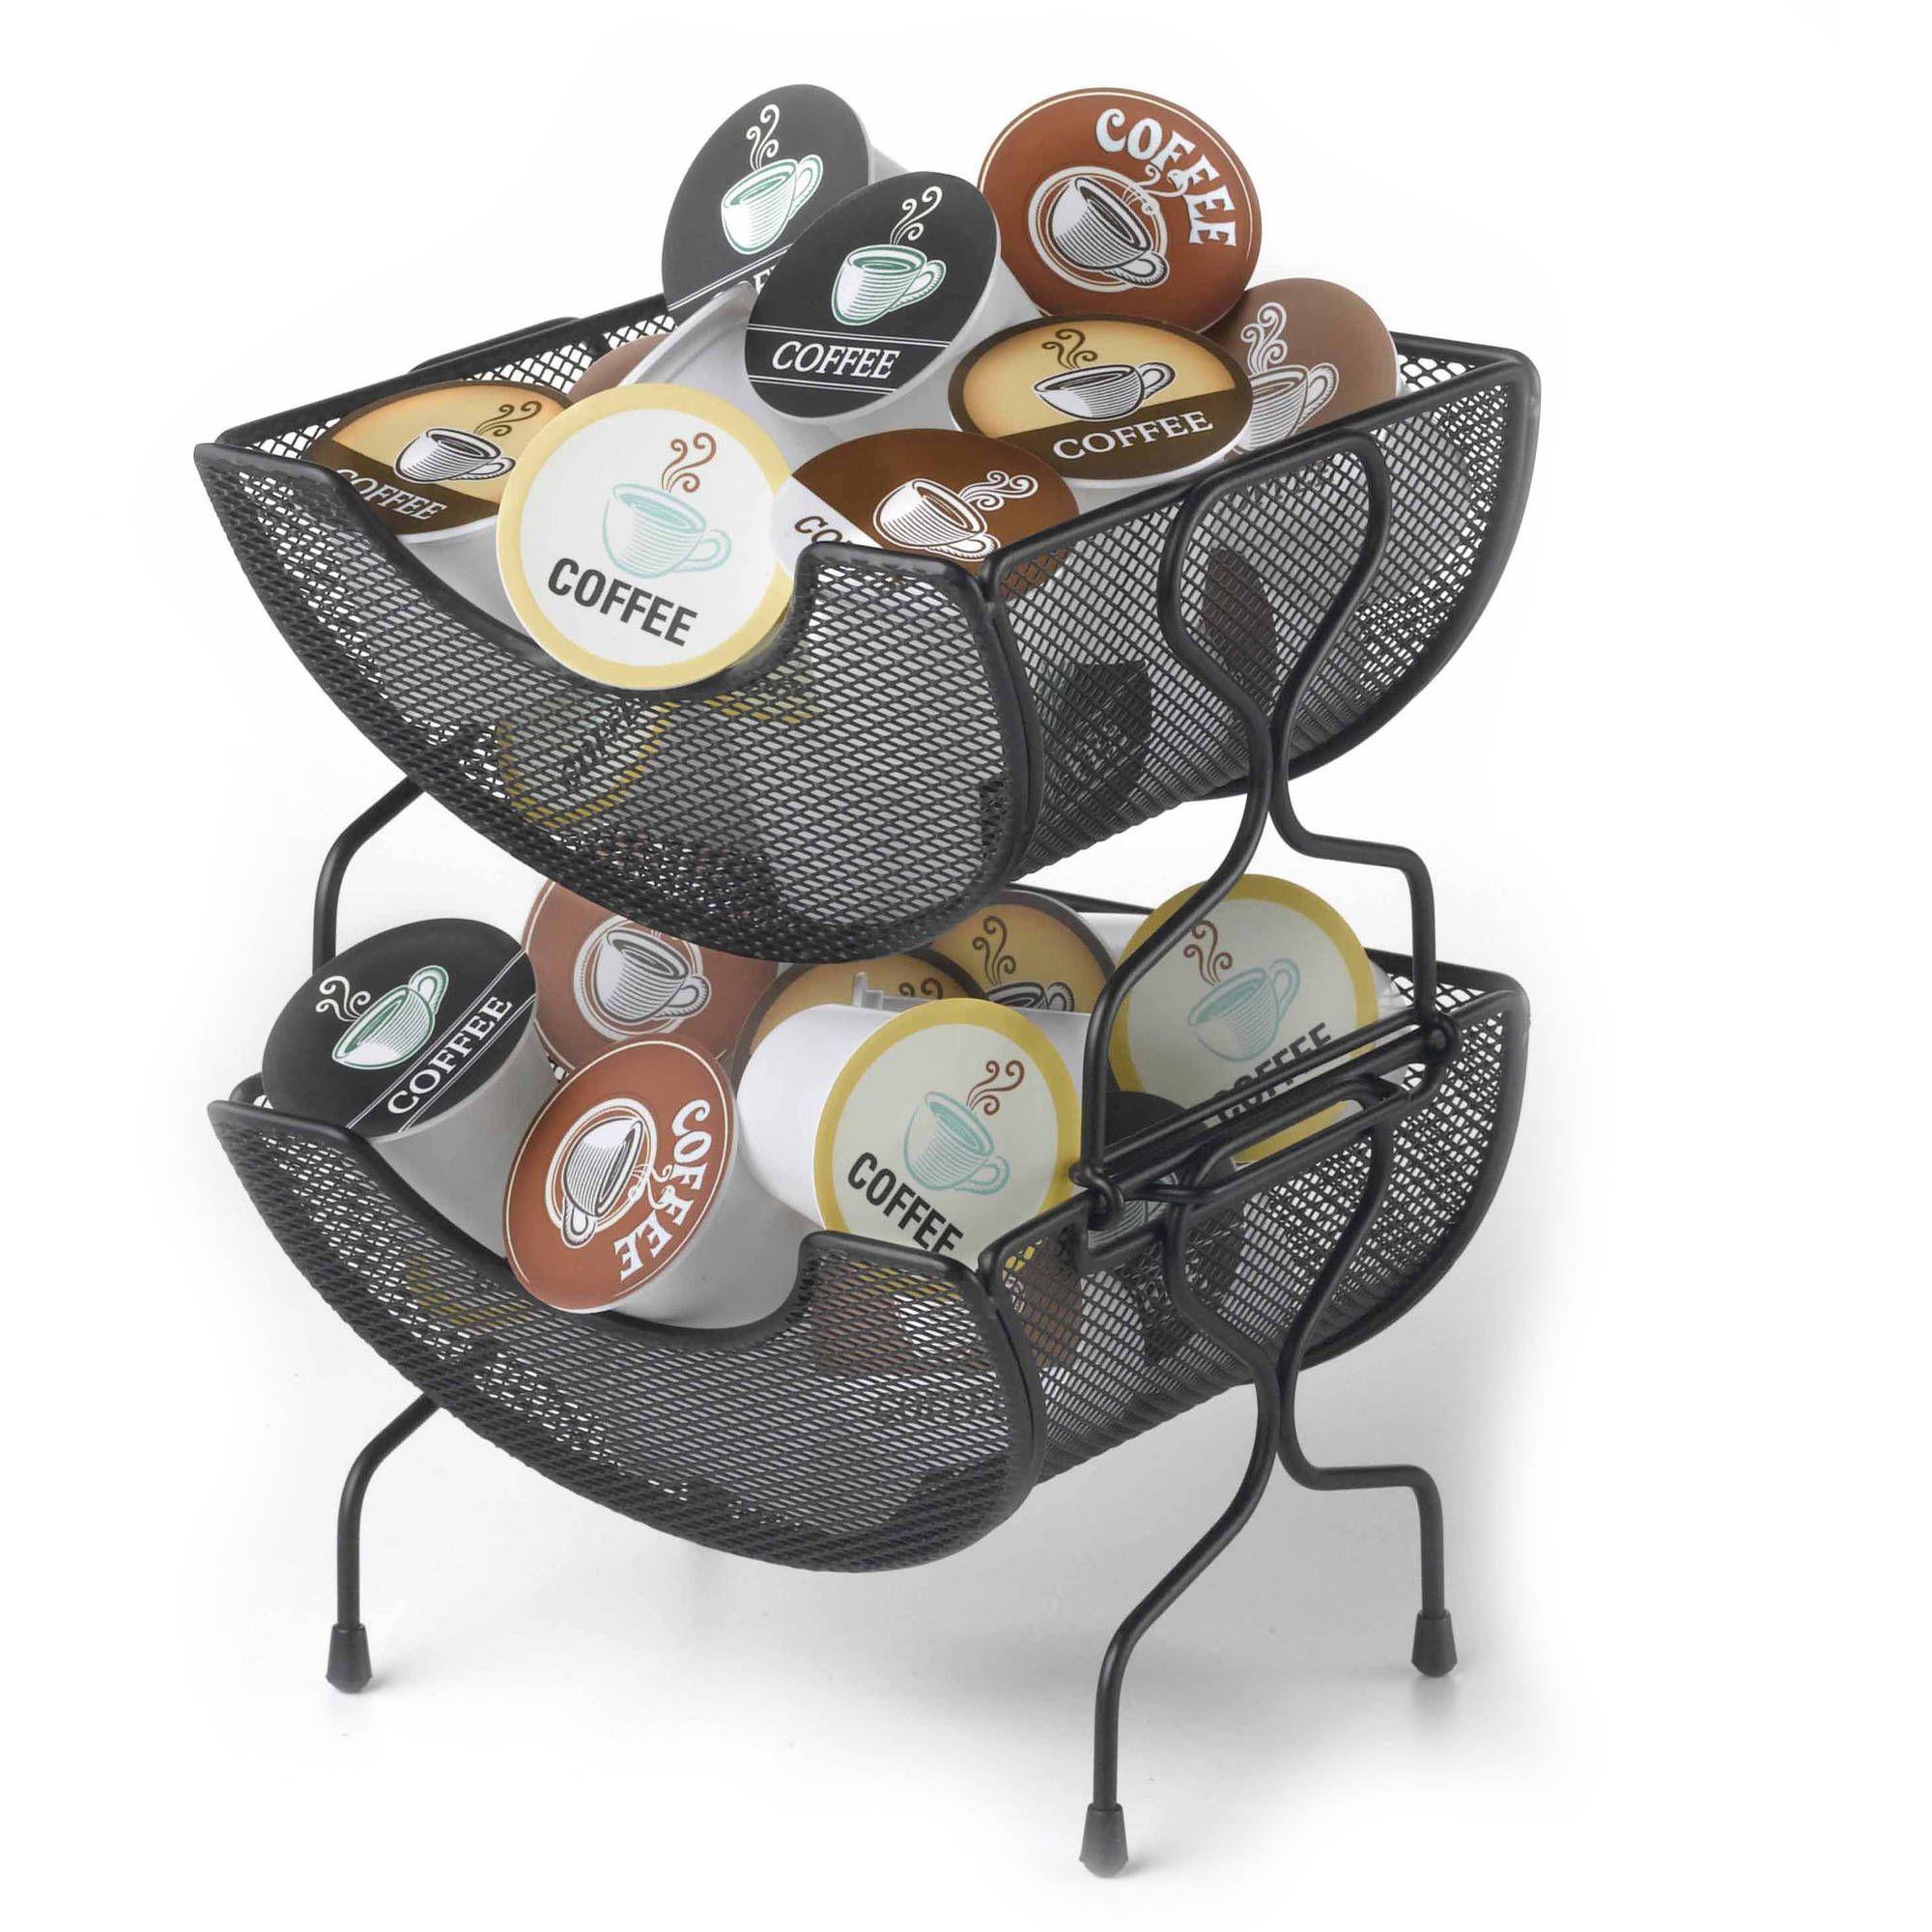 Home in 2020 Utility baskets, Coffee basket, Storage baskets